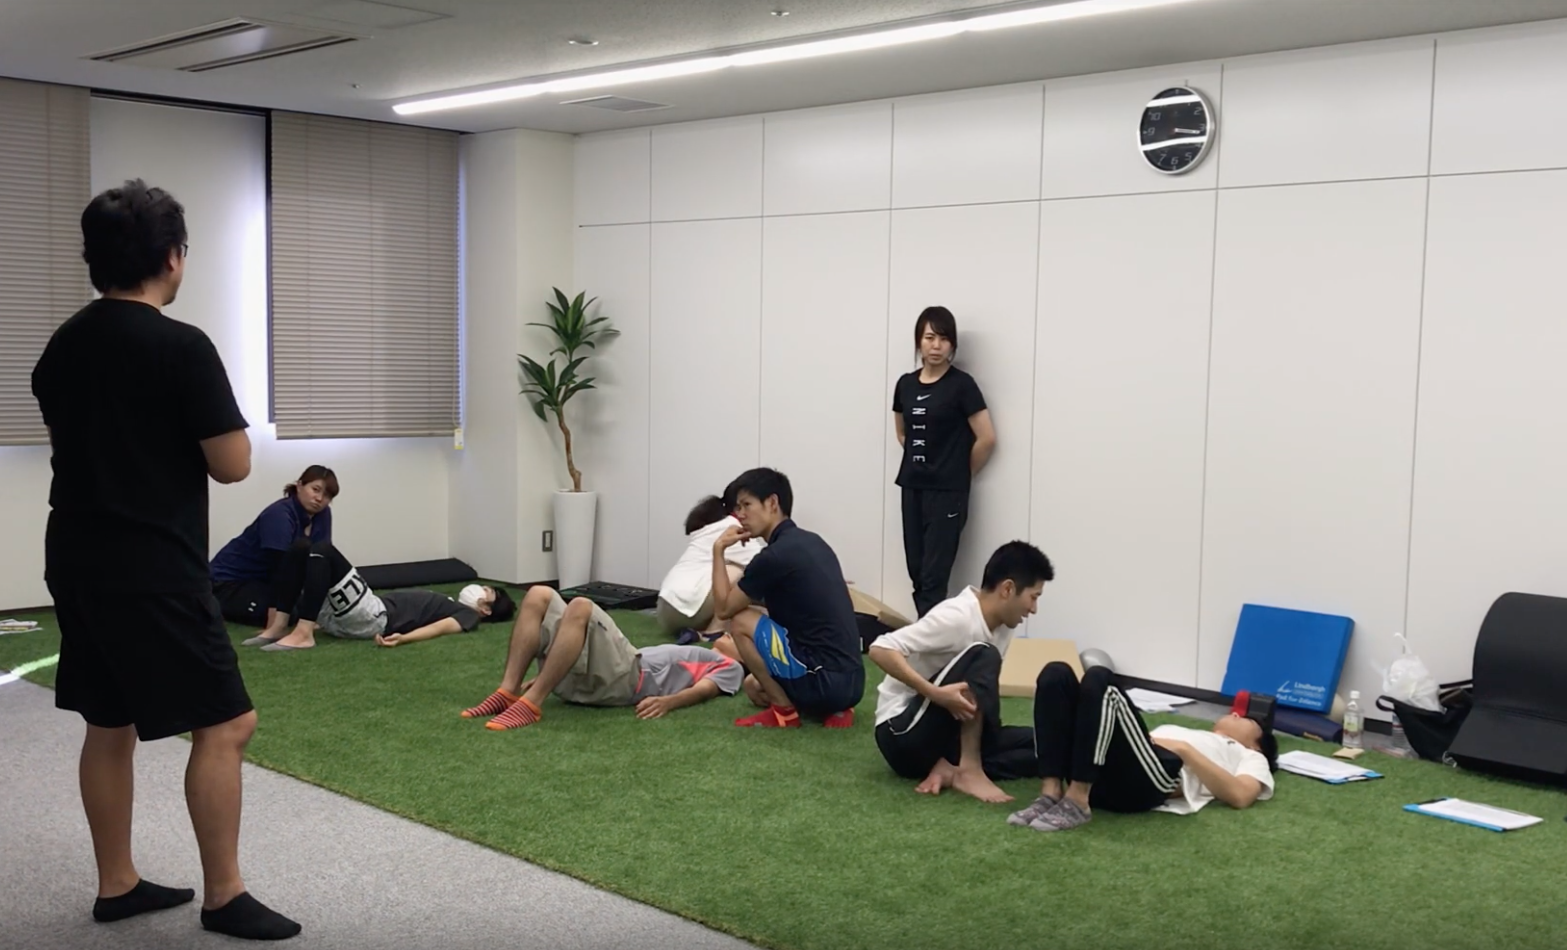 【沖縄→愛知出張】日本スポーツ施術者協会研修